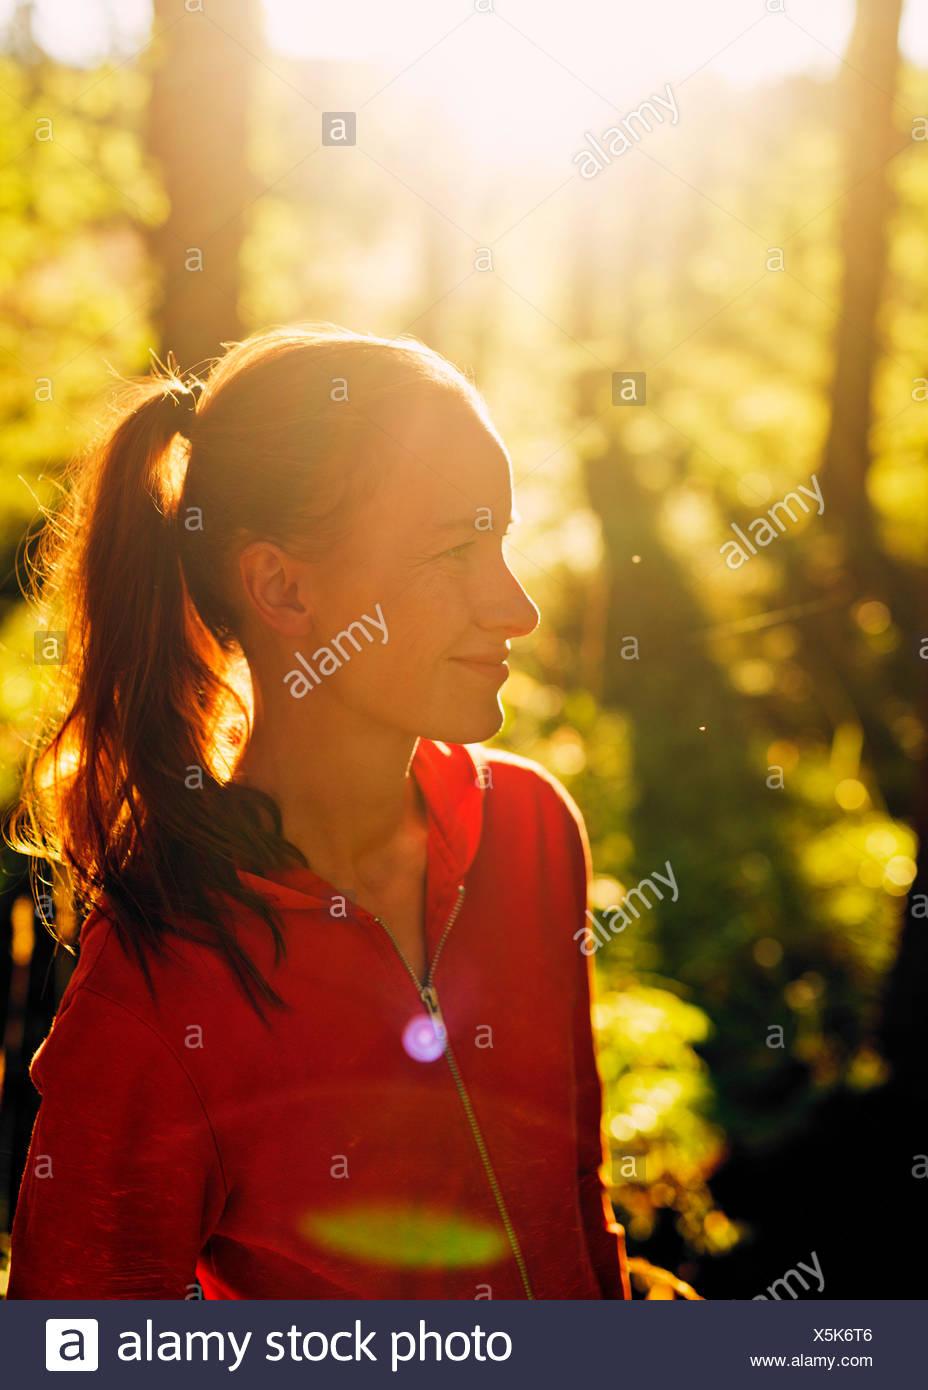 La Finlande, l'Paijat-Hame, Heinola, Mid-adult woman in forest Photo Stock